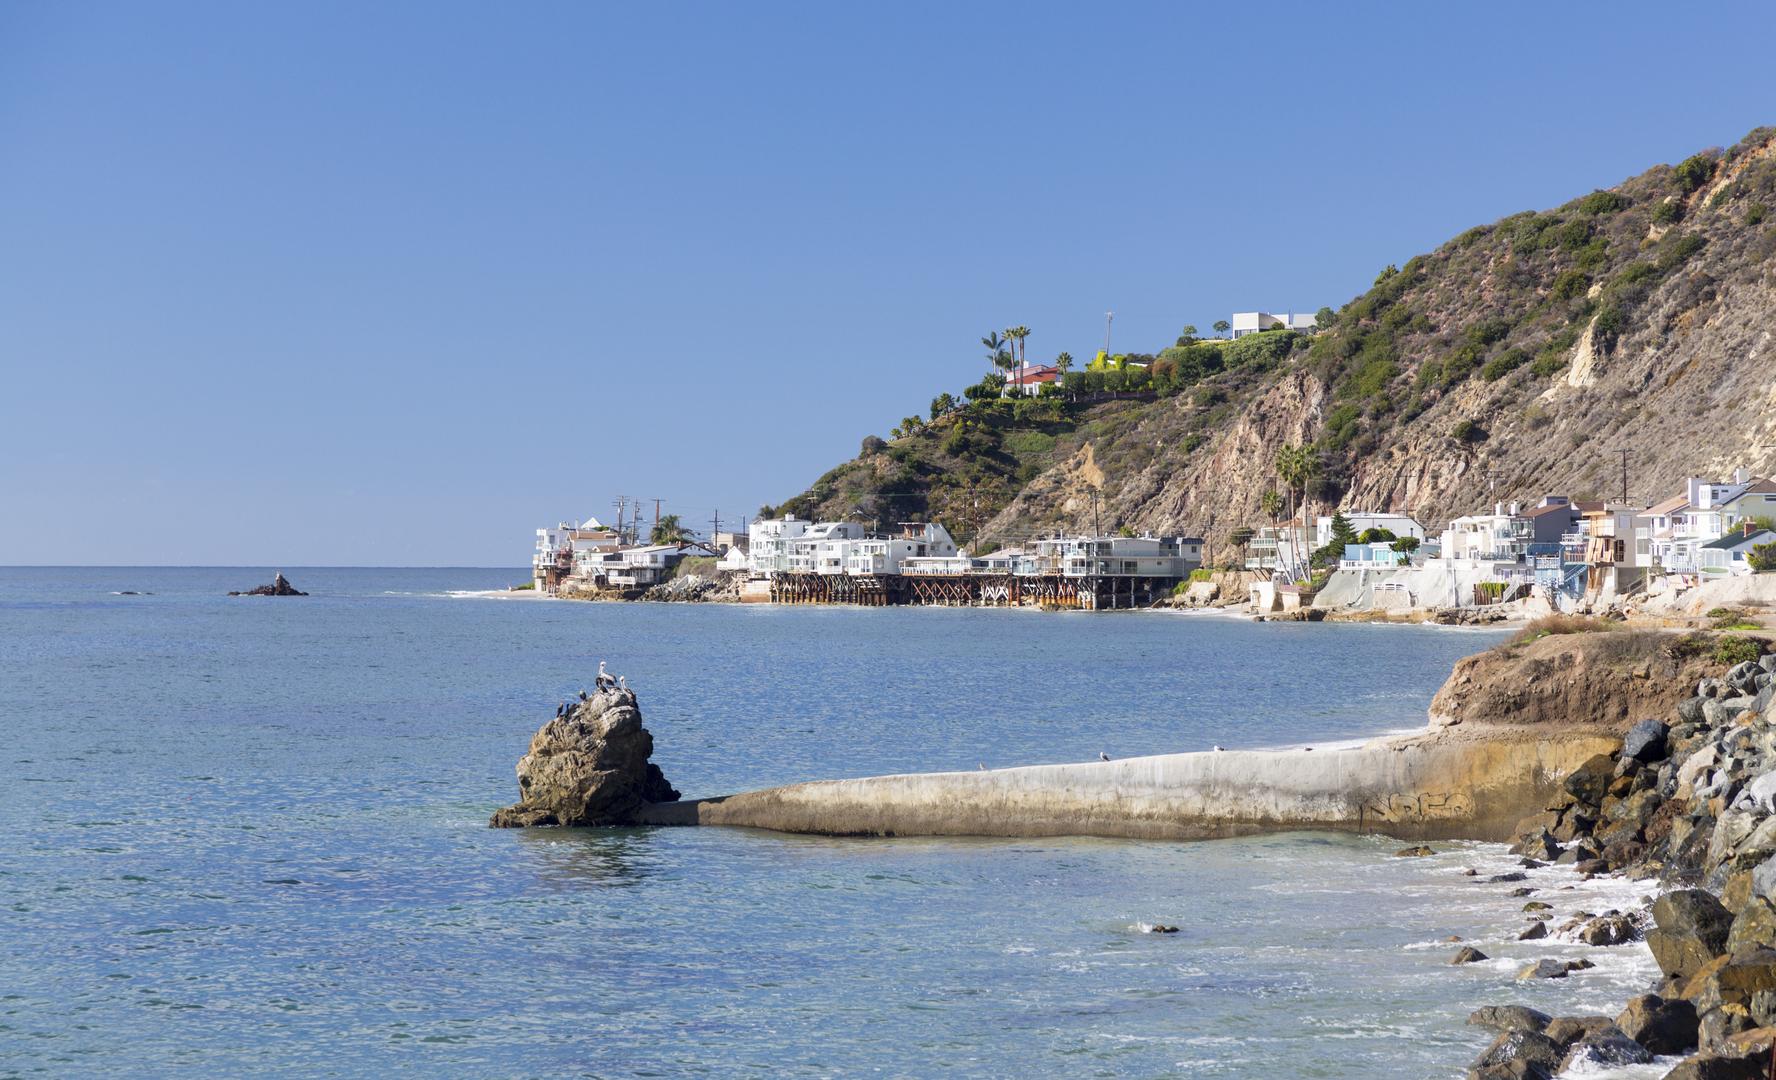 Modern houses overhang ocean and waves in Malibu California